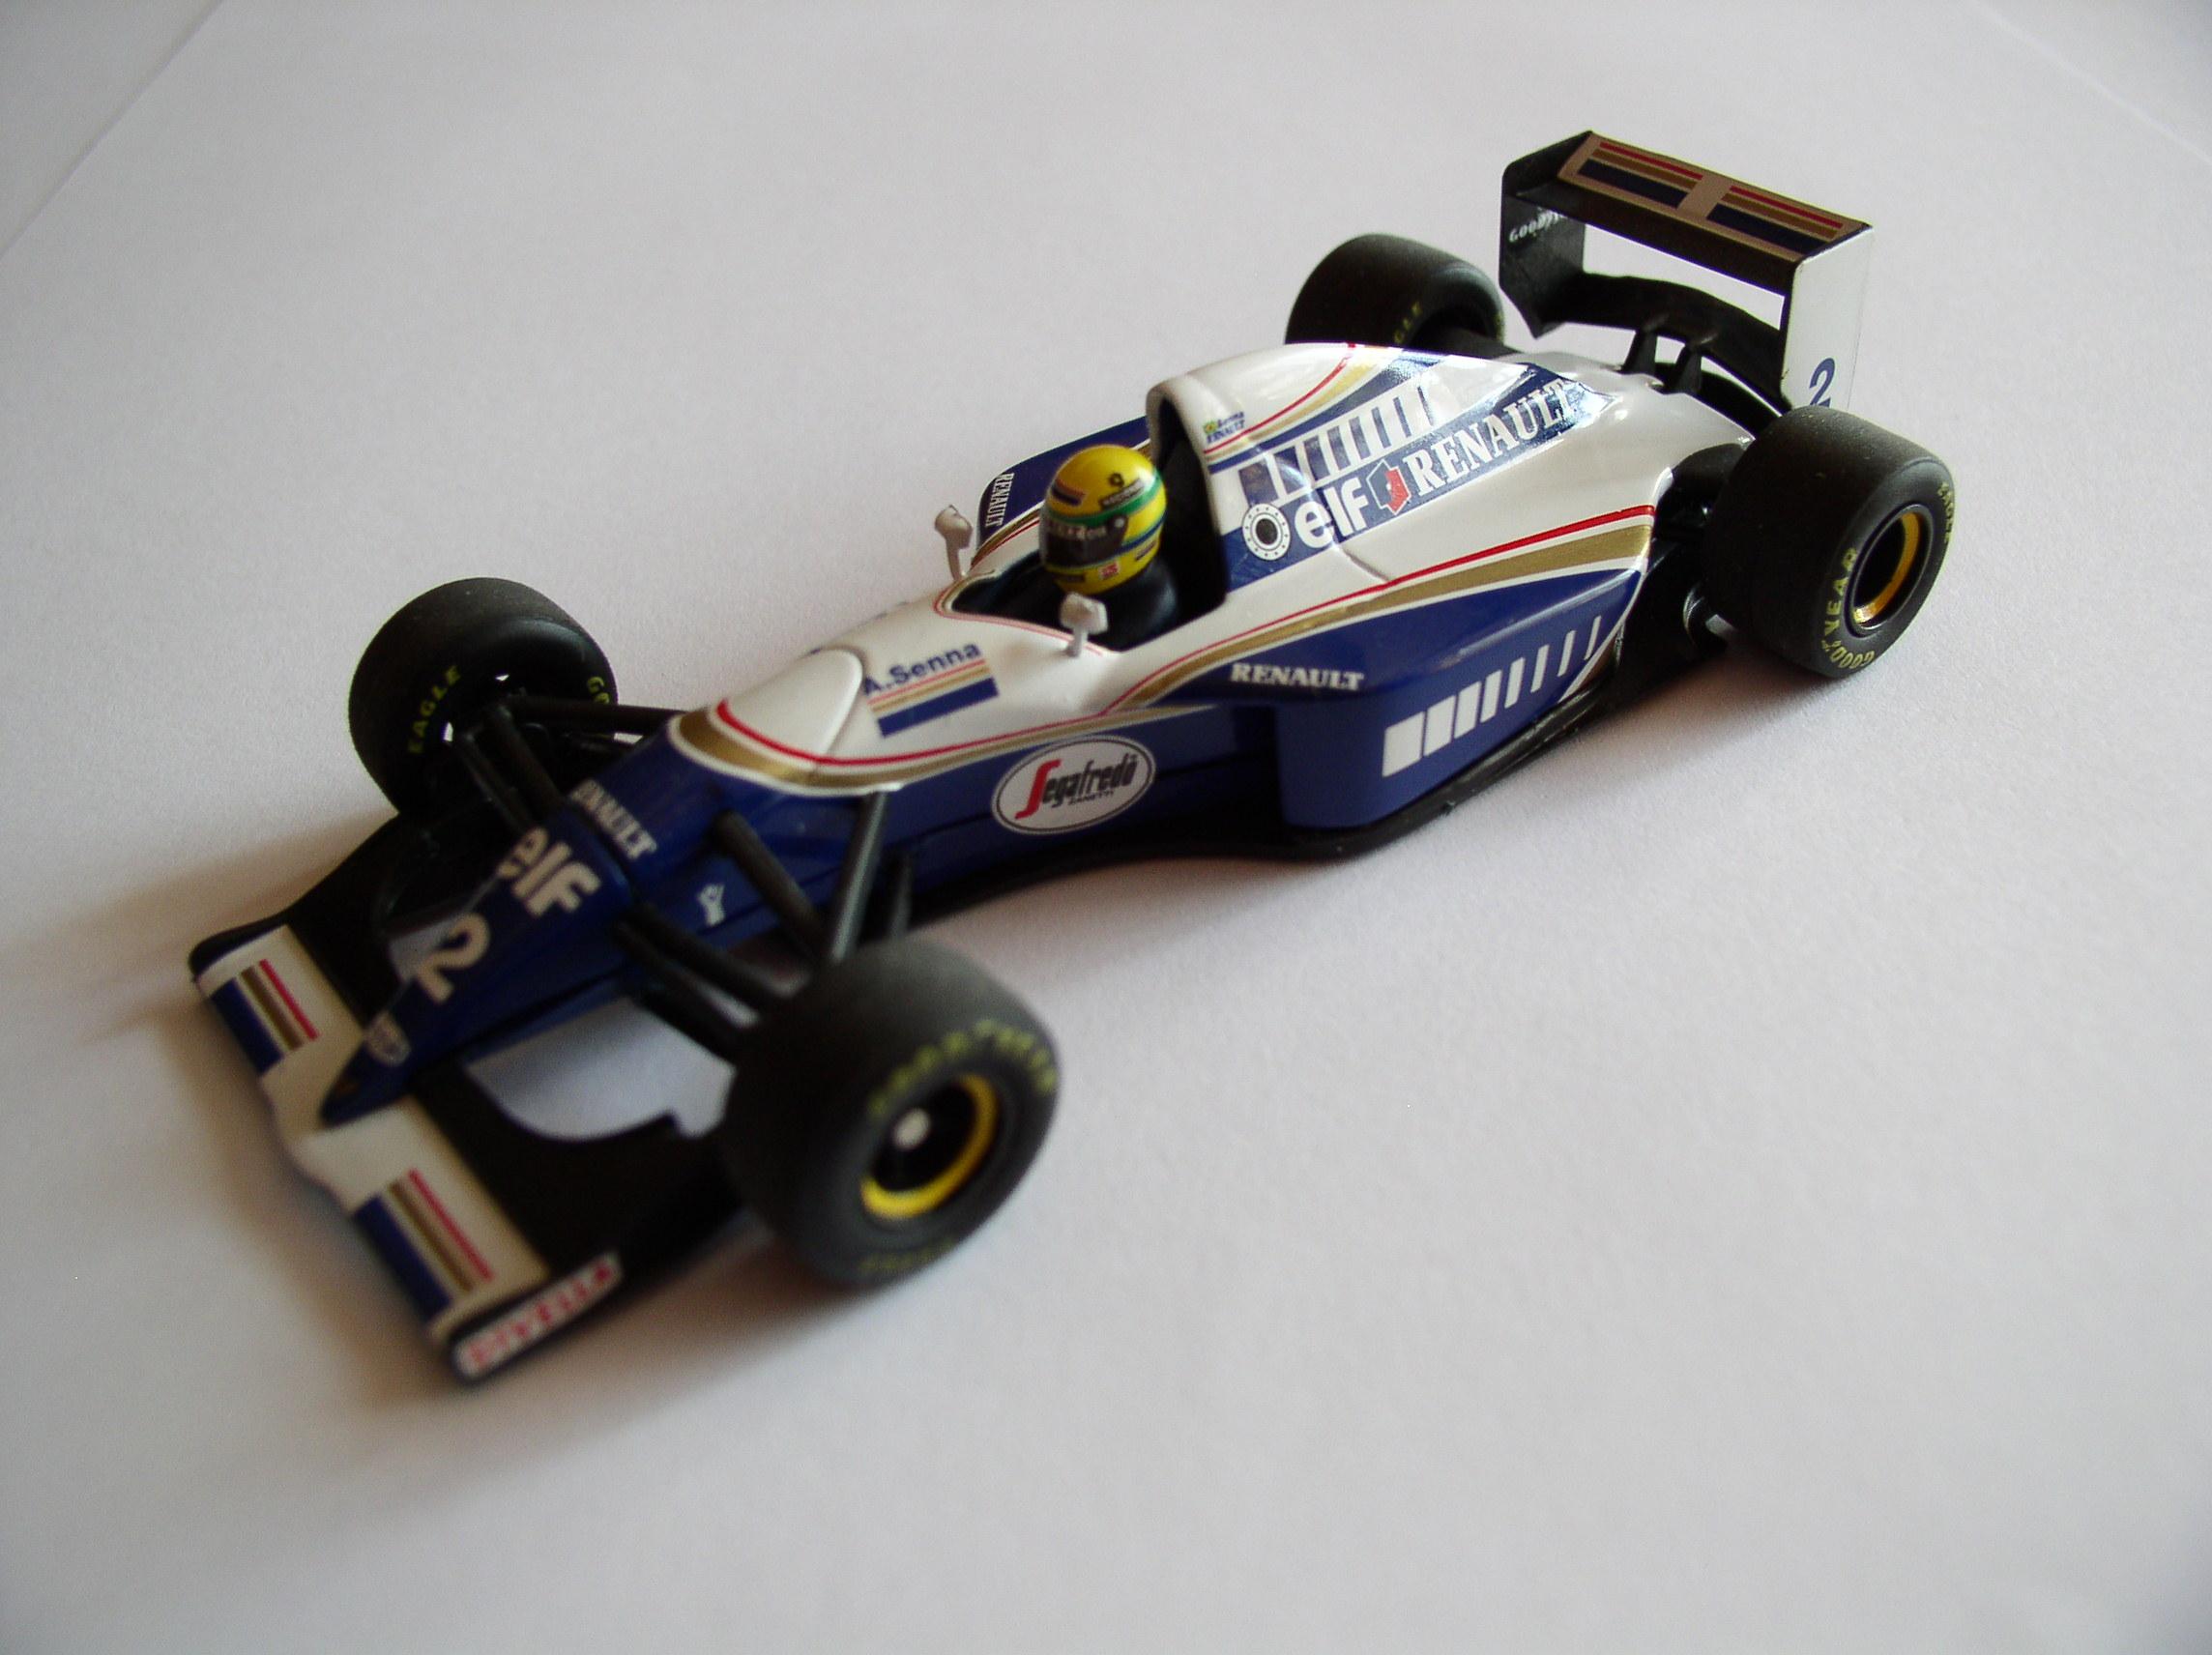 Ayrton Senna Rothmans Car Wallpaper 301 Moved Permanently